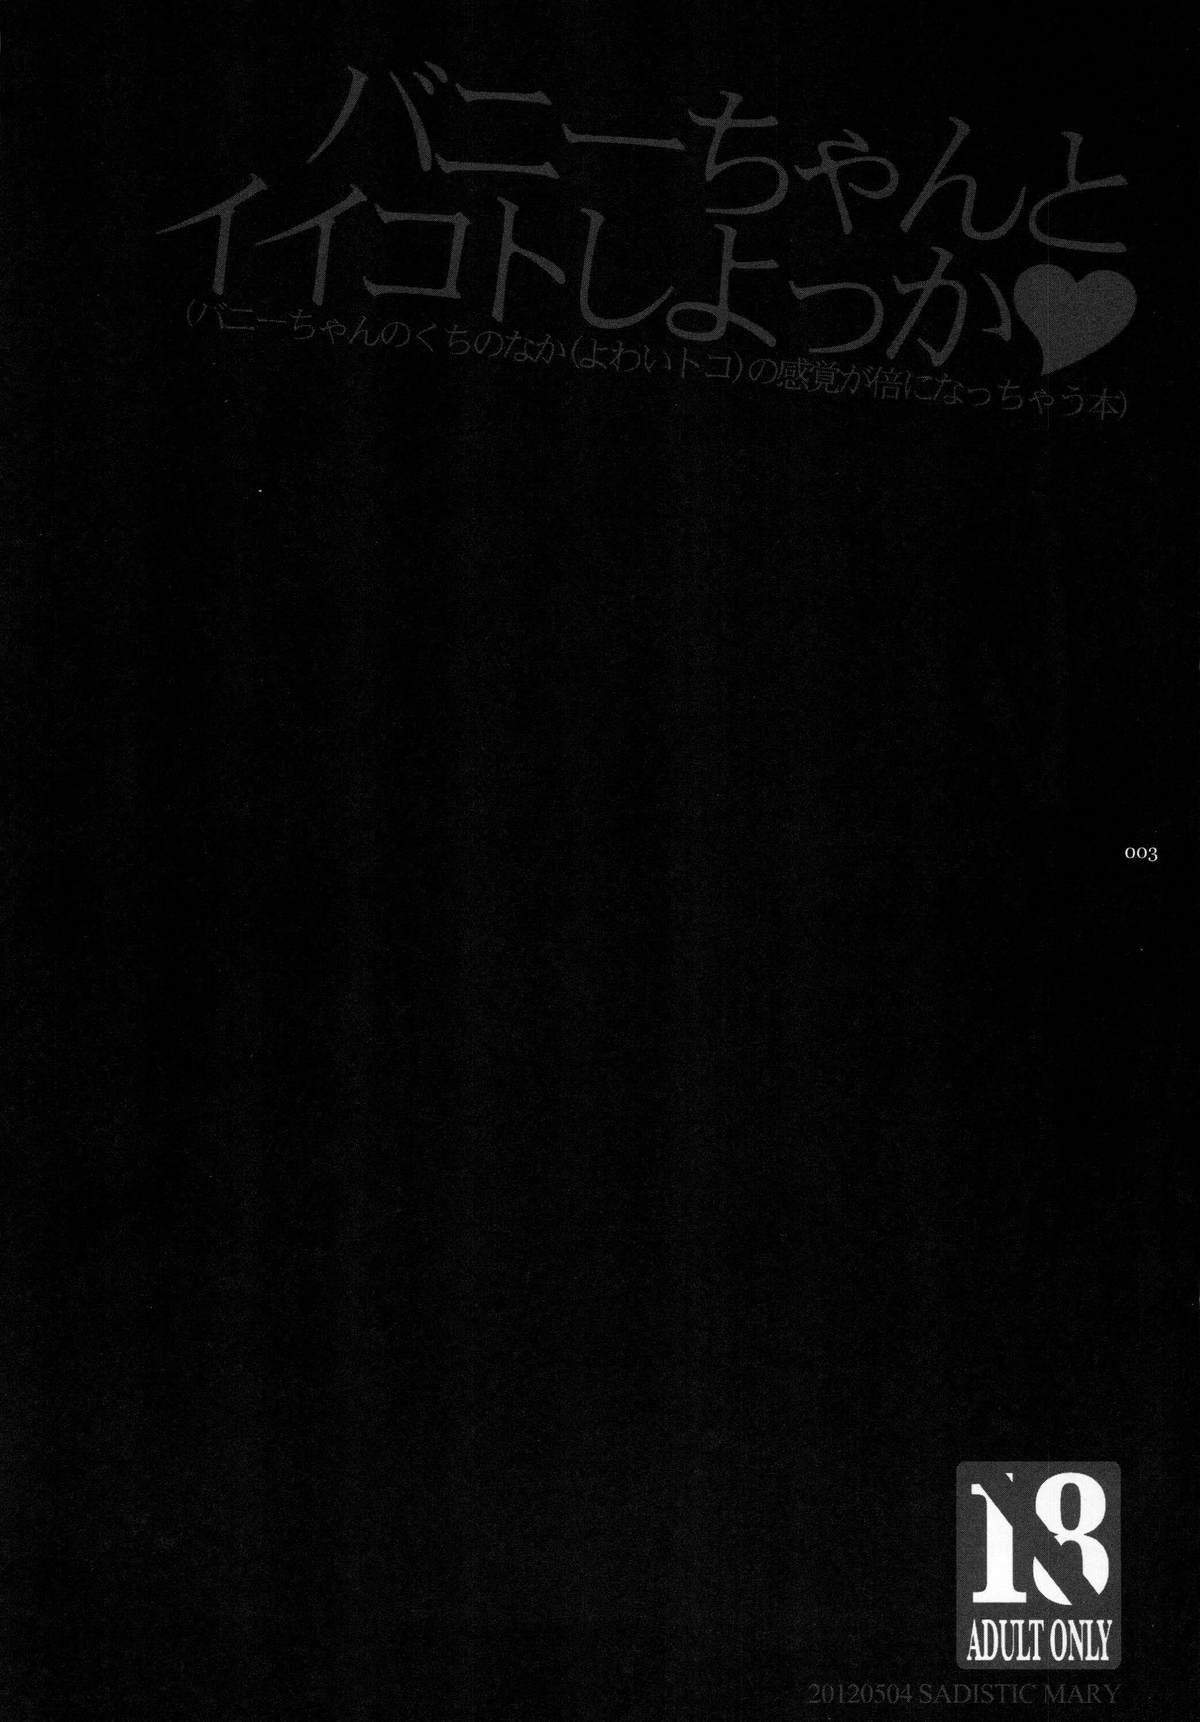 Bunny-chan to Iikoto Shiyokka 2